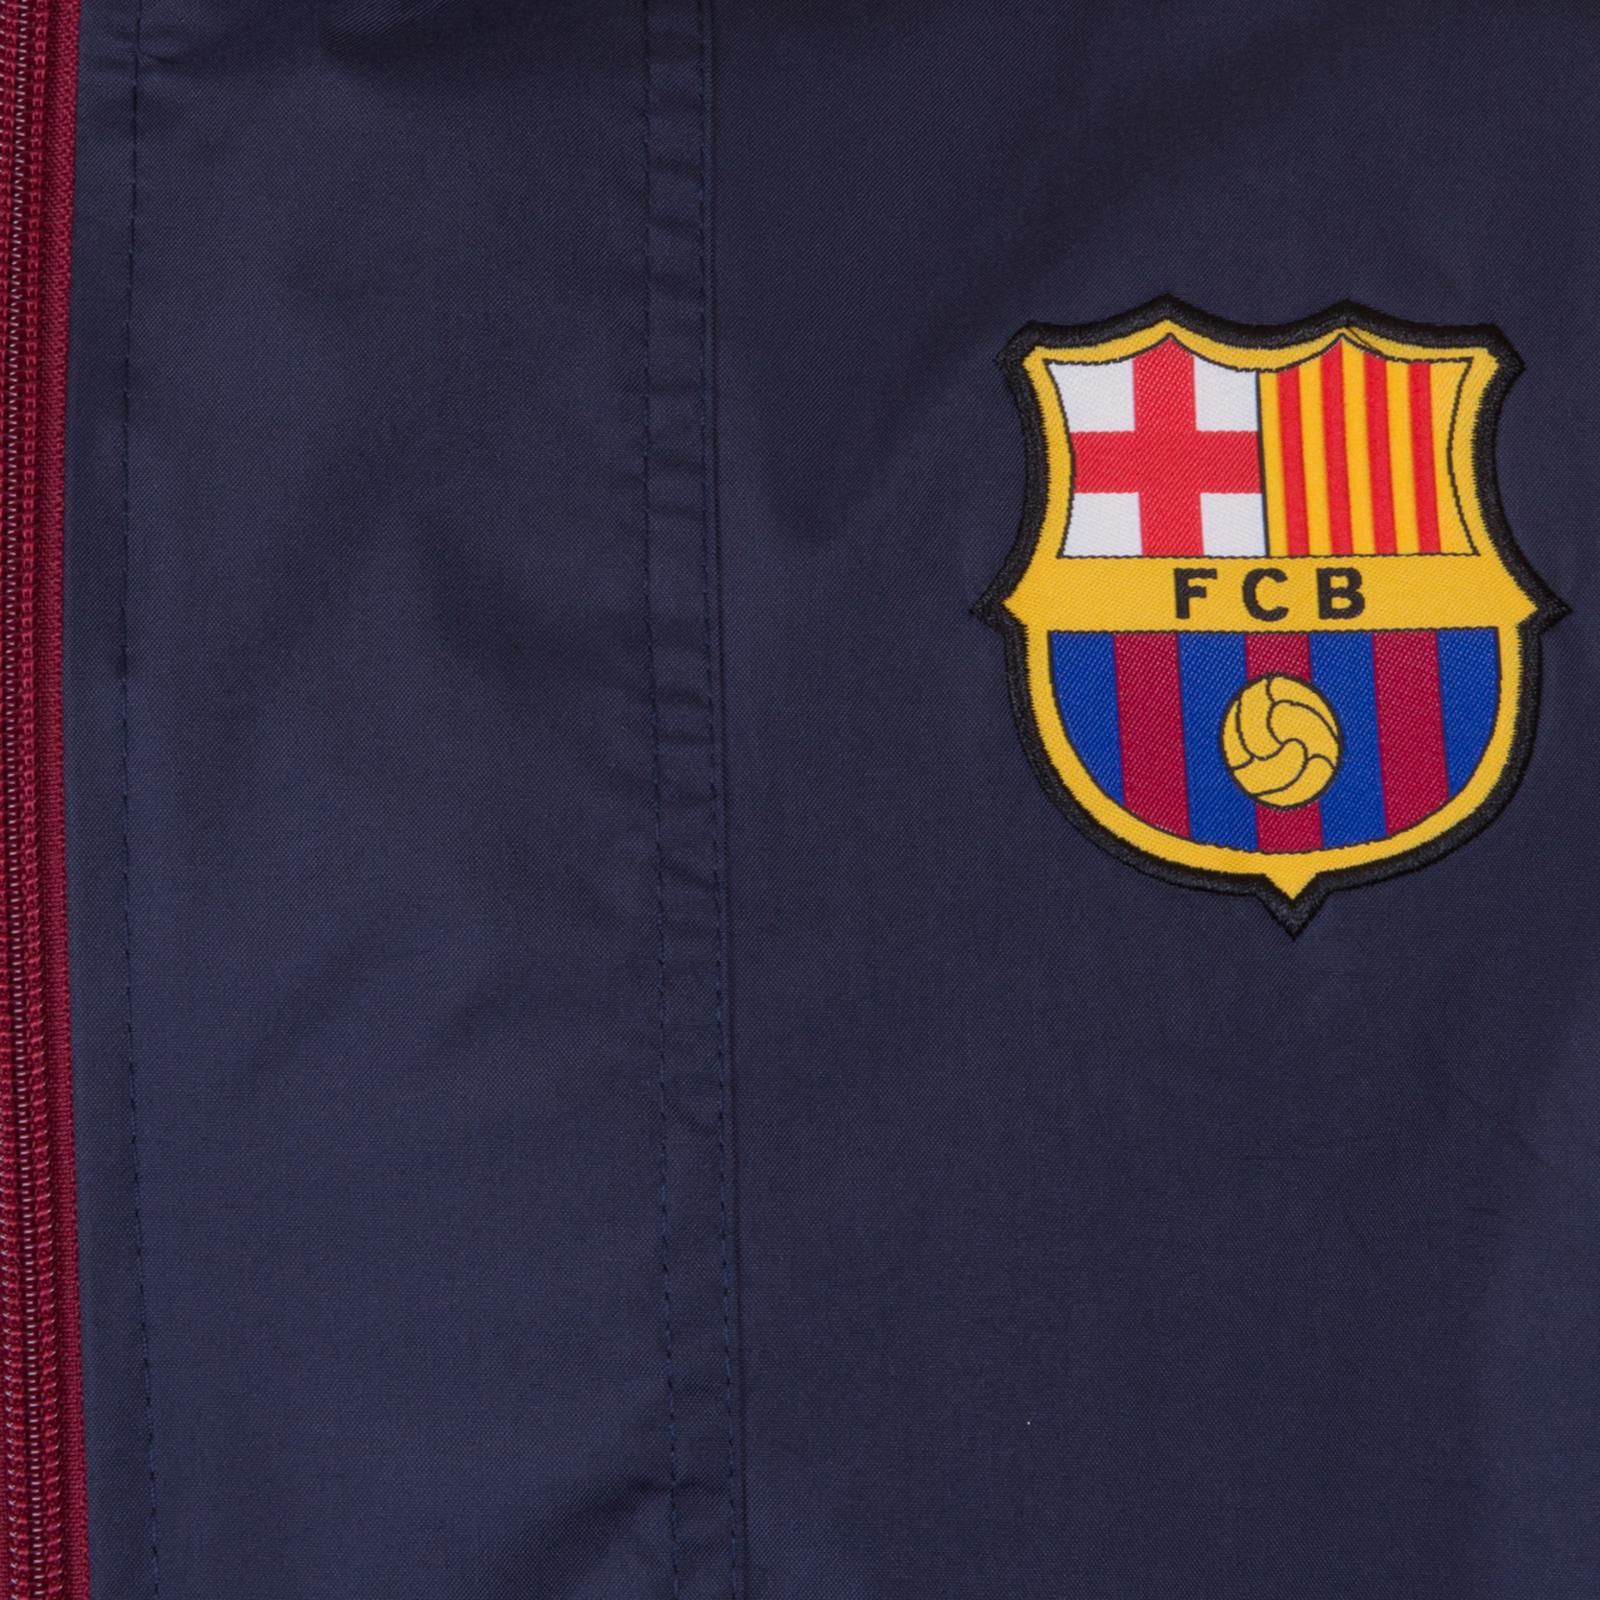 FC-Barcelona-Chaqueta-cortavientos-oficial-Para-hombre-Impermeable 59e83a0a583